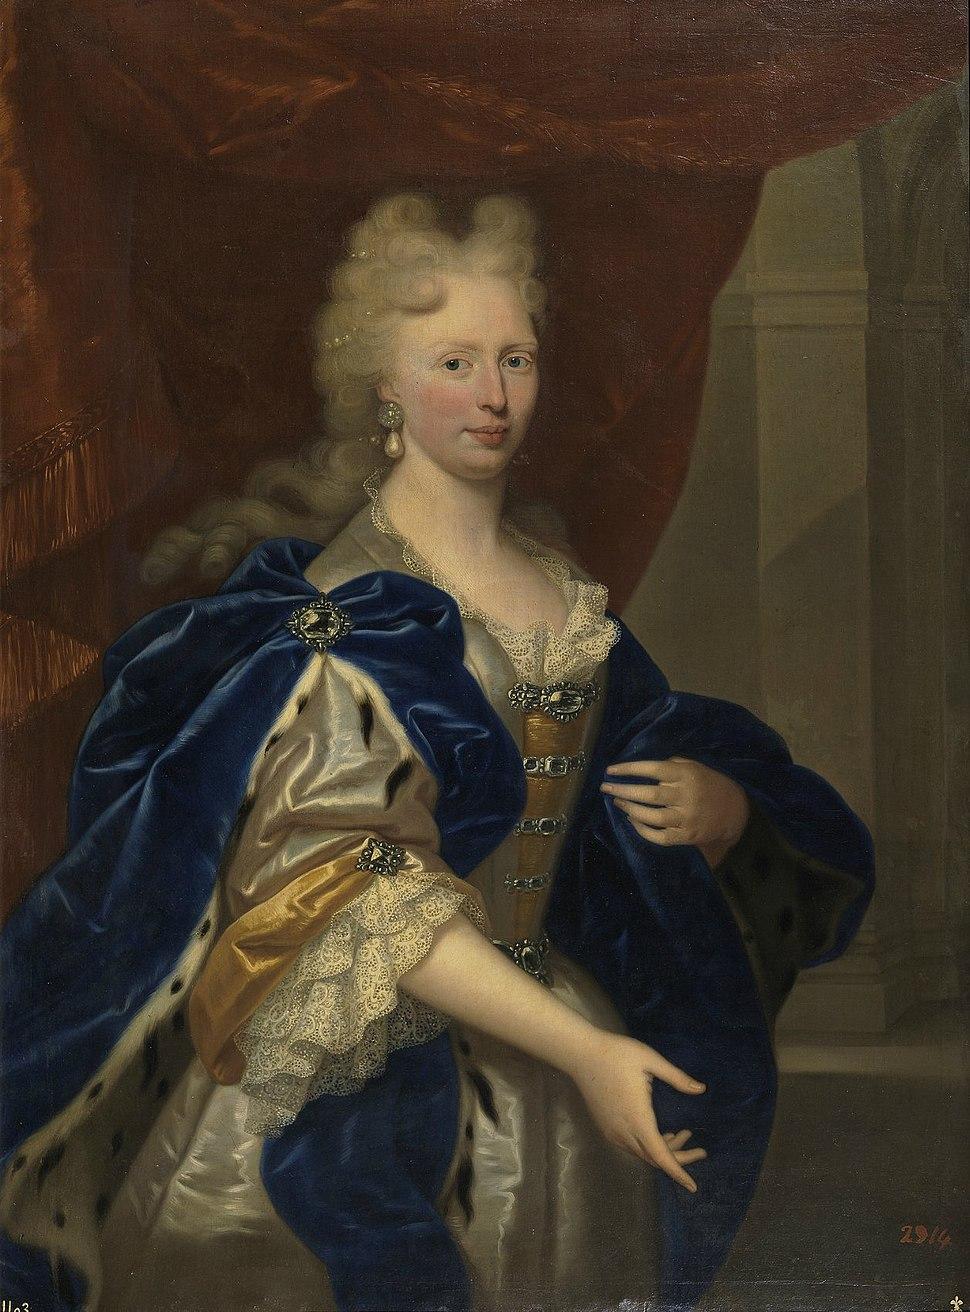 Dorothea Sophia of Neuburg, duchess of Parma